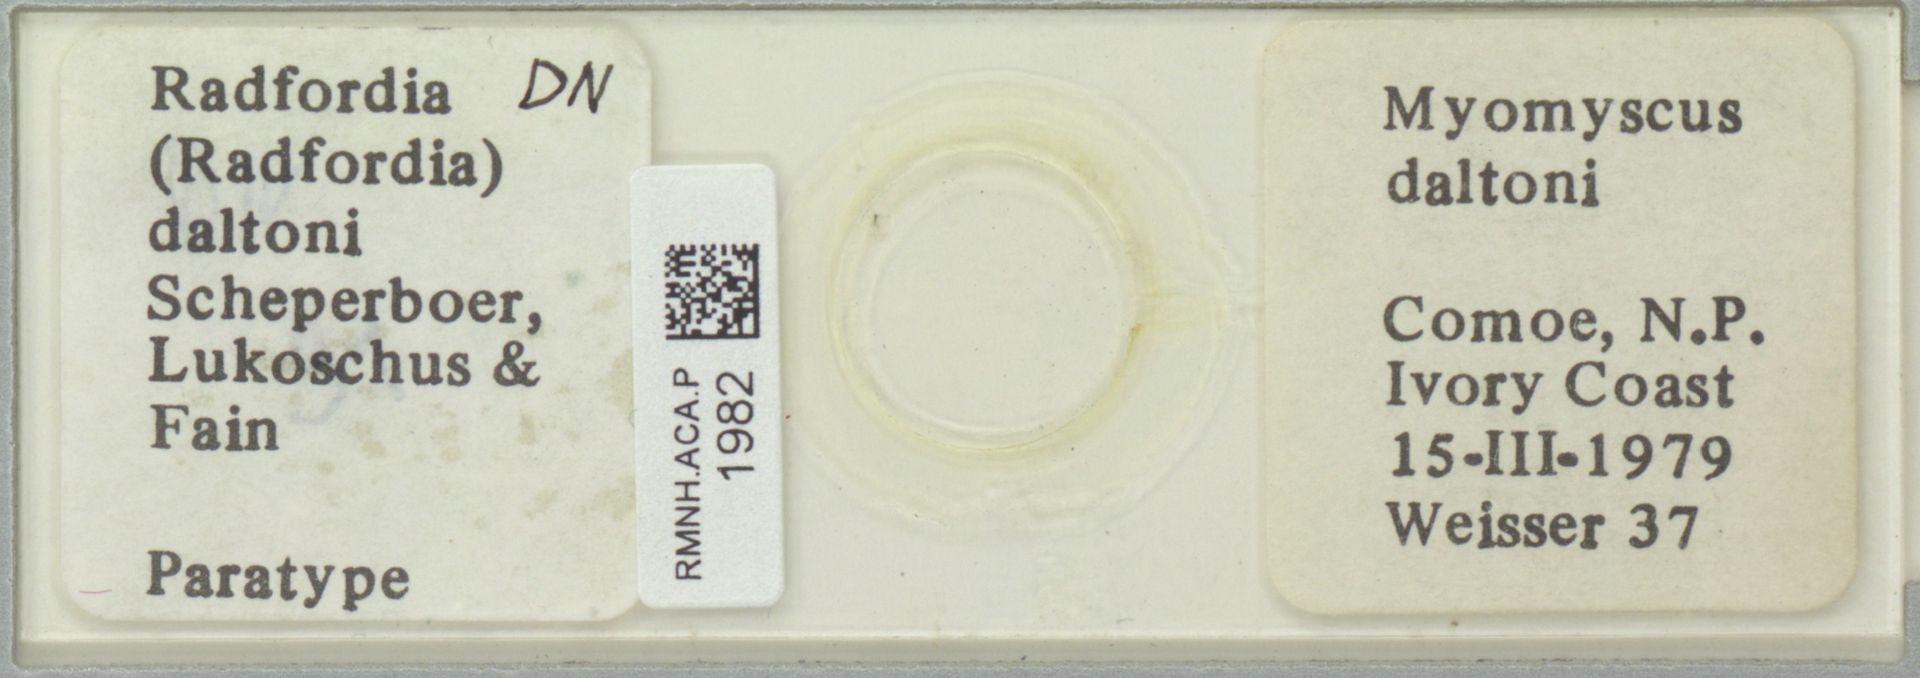 RMNH.ACA.P.1982 | Radfordia (Radfordia) daltoni Scherperboer, Lukoschus & Fain